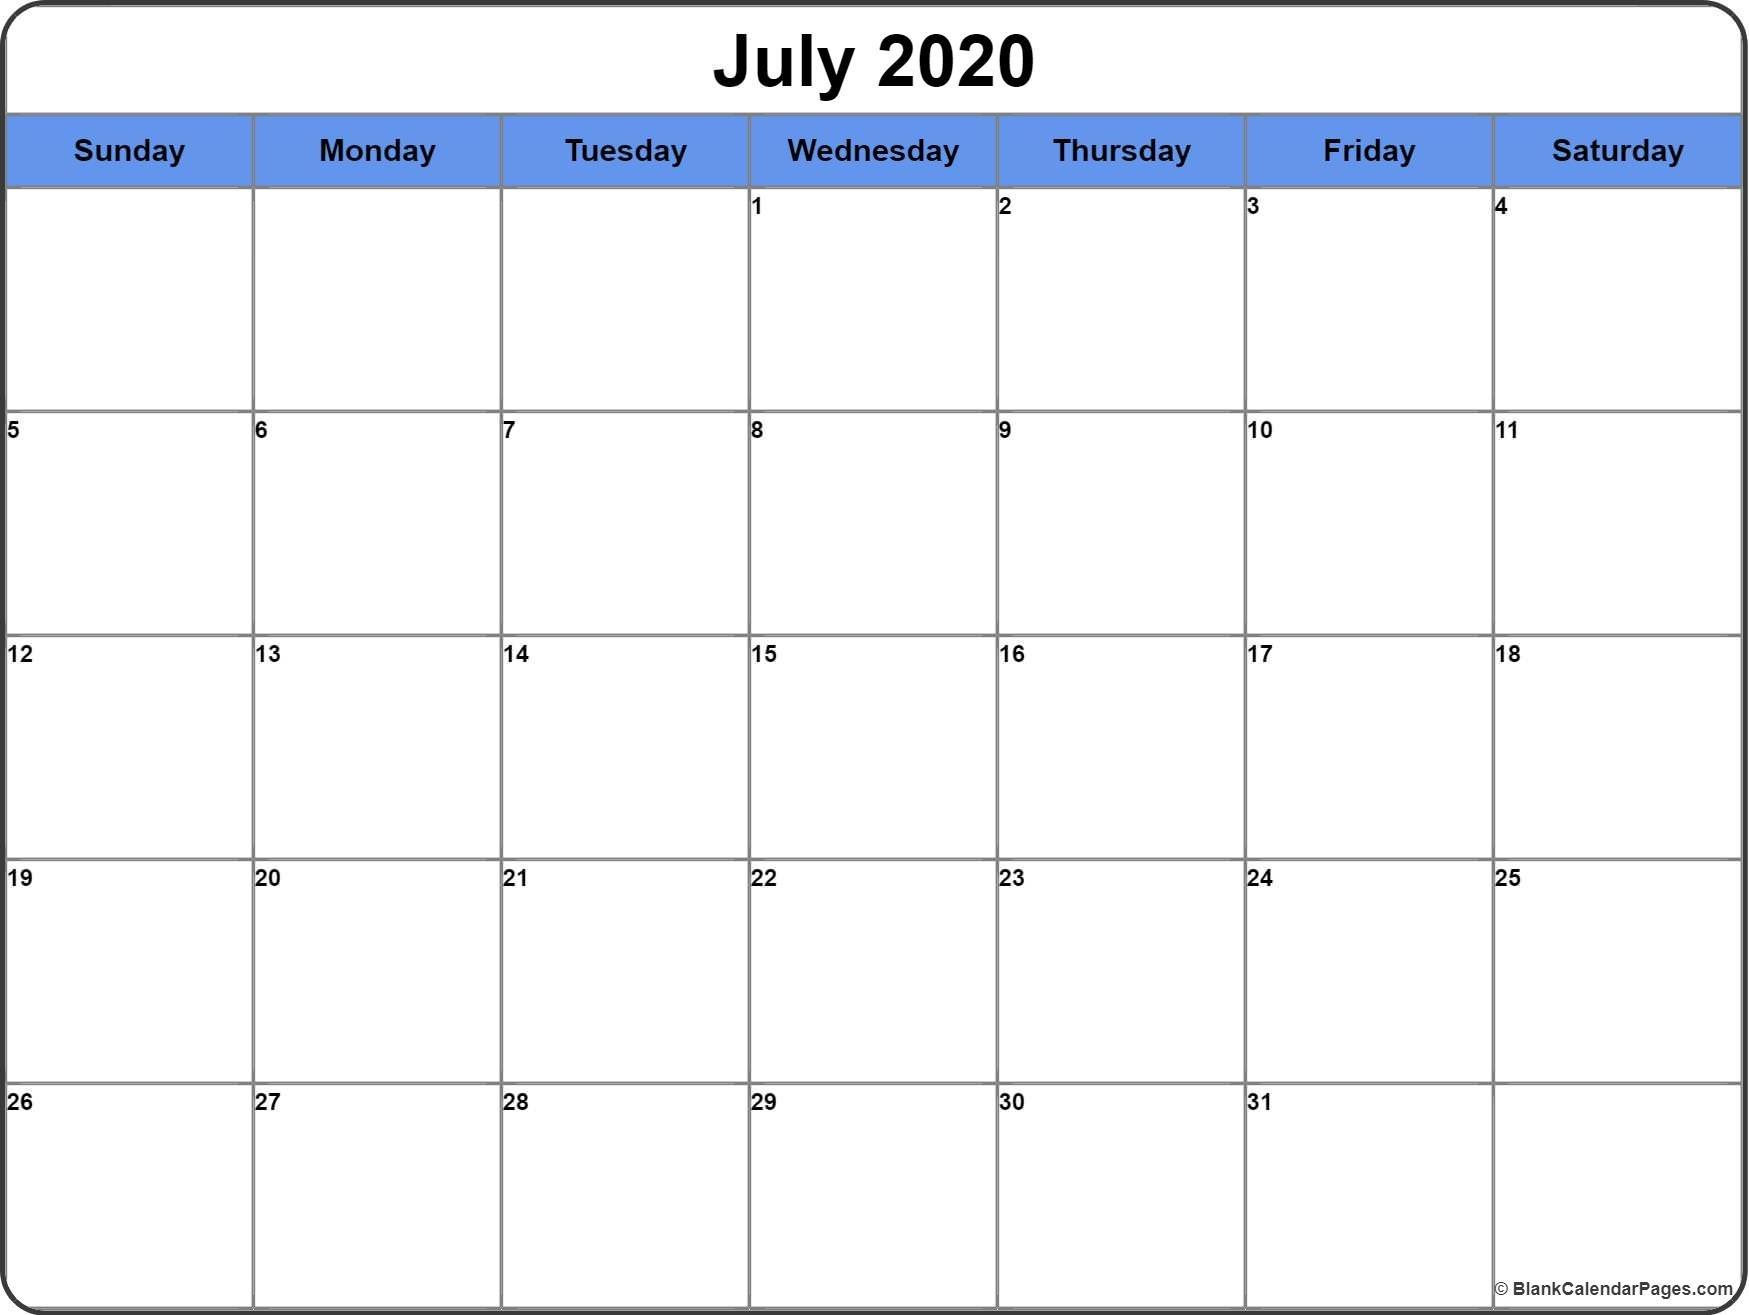 July 2020 Calendar | Free Printable Monthly Calendars-3 Month Blank Calendar June-August 2020